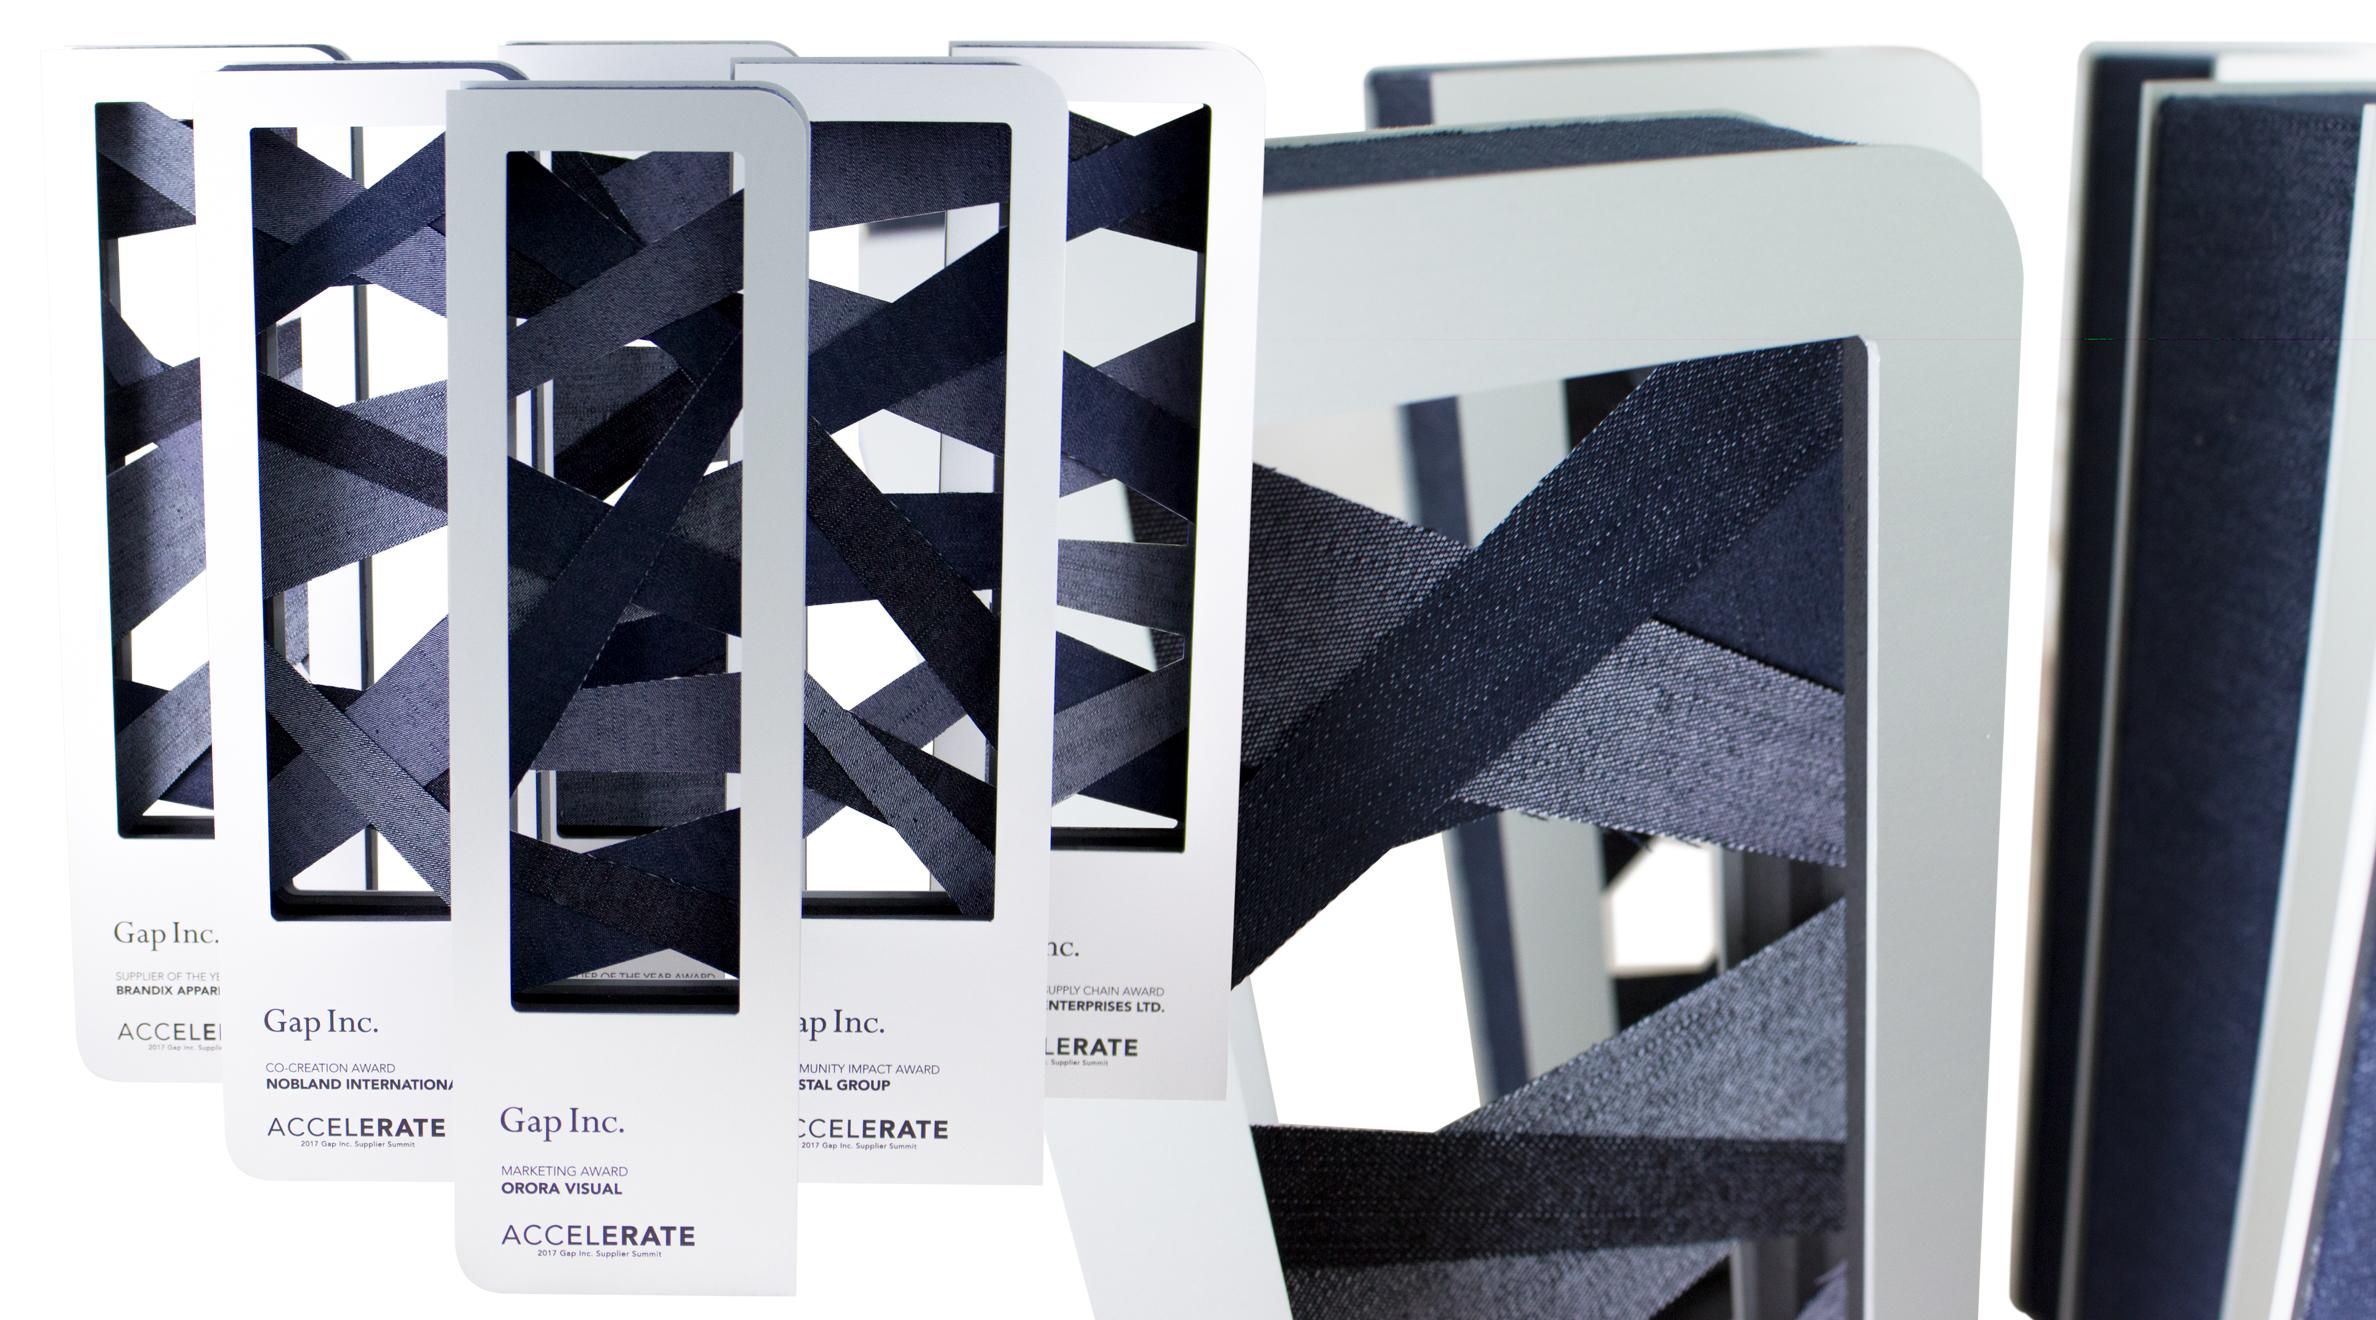 gap-inc-cutom-awards-corporate-reccognition-special-denim-trophy-2.jpg